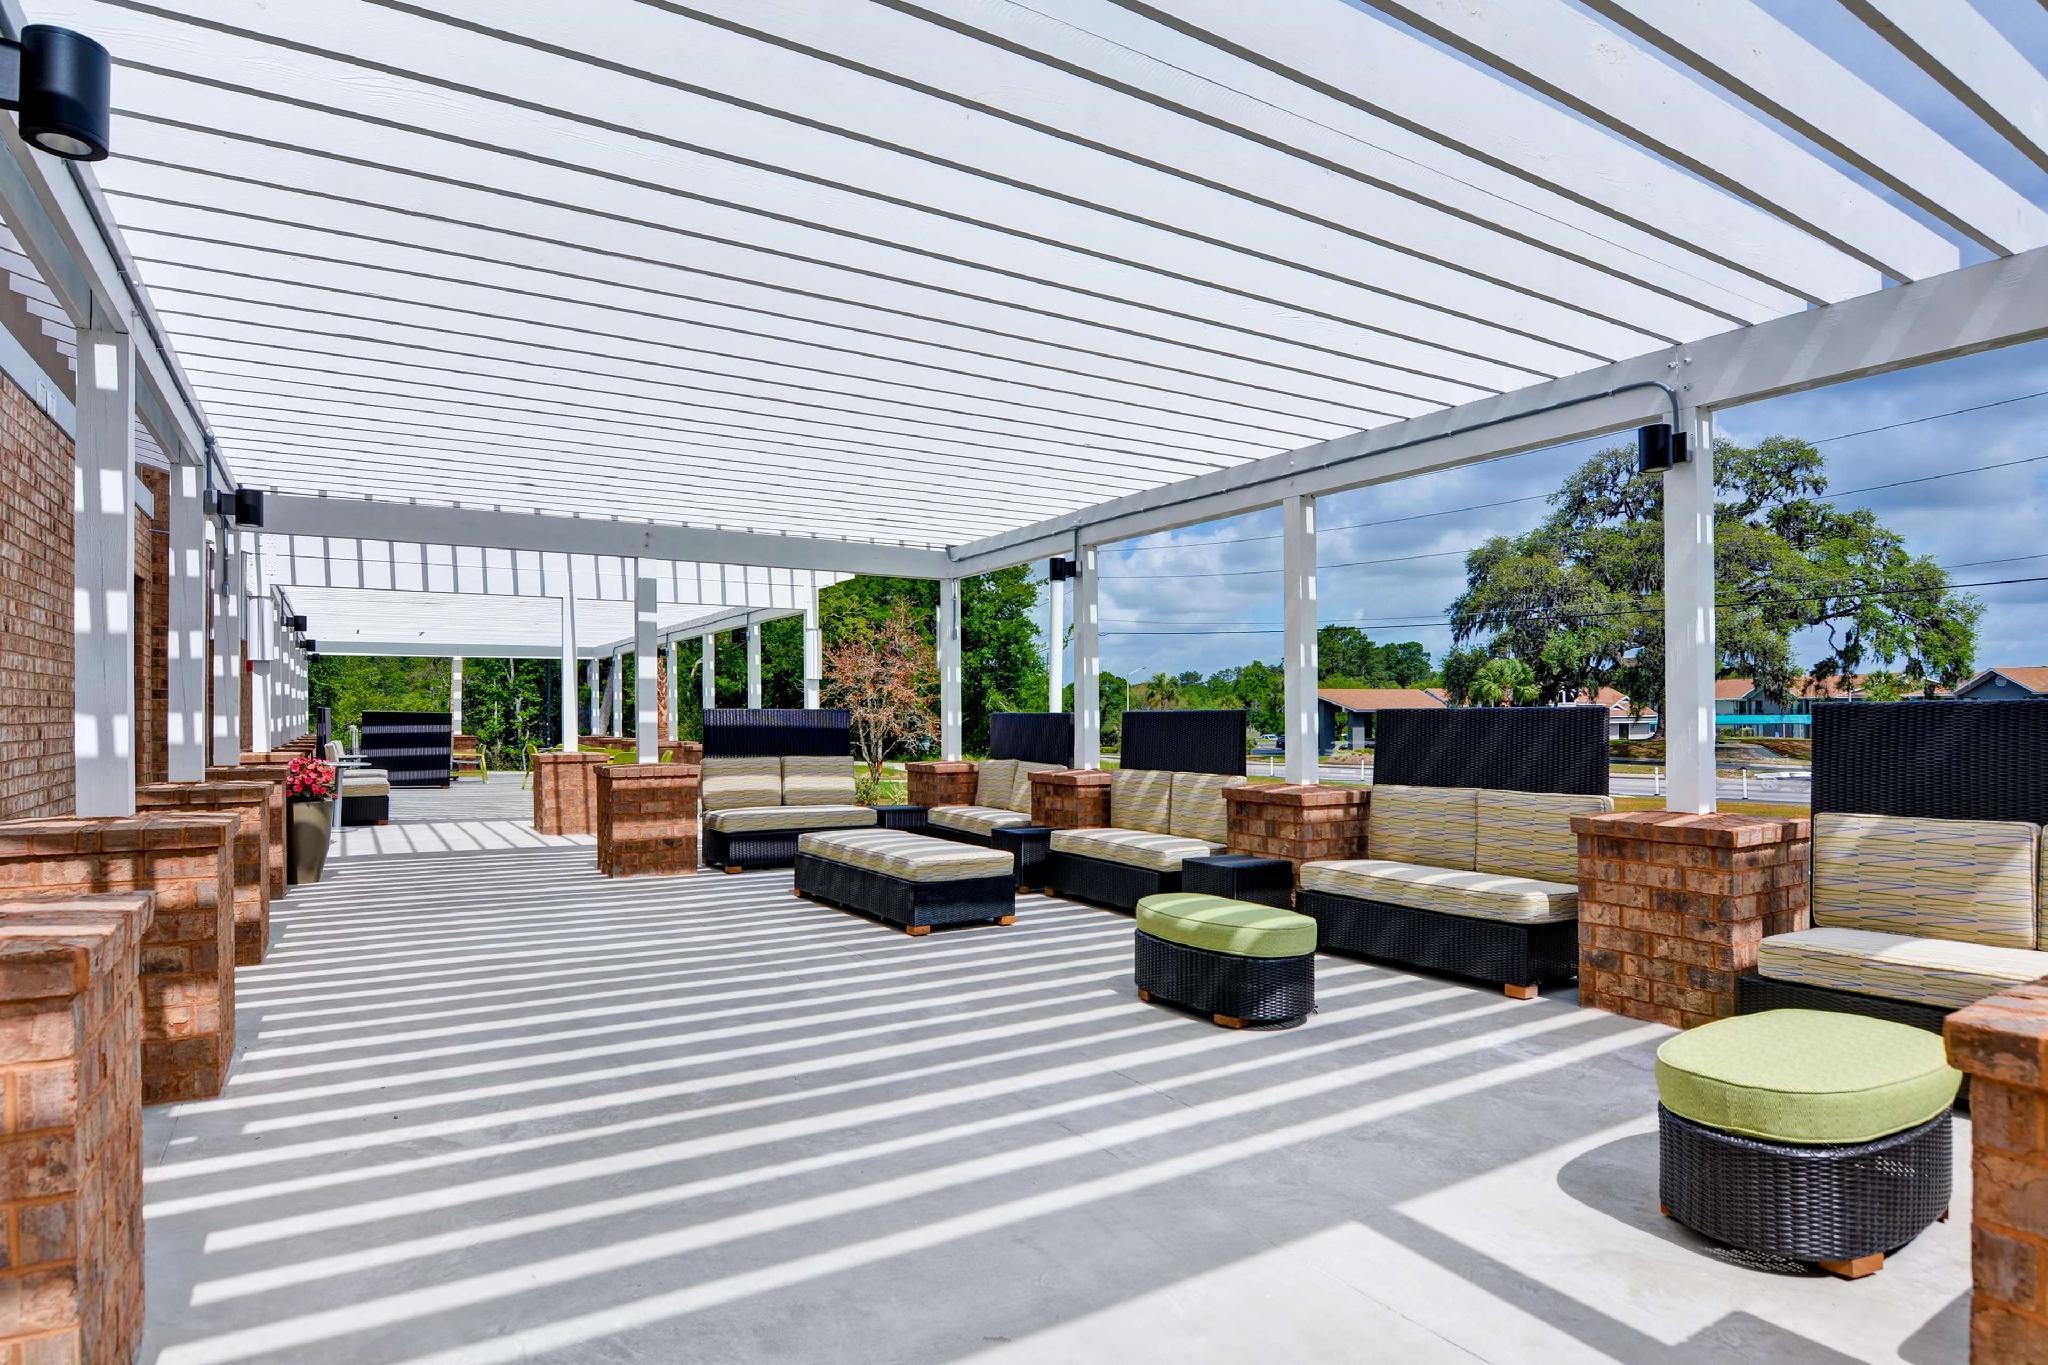 Home2 Suites By Hilton Beaufort